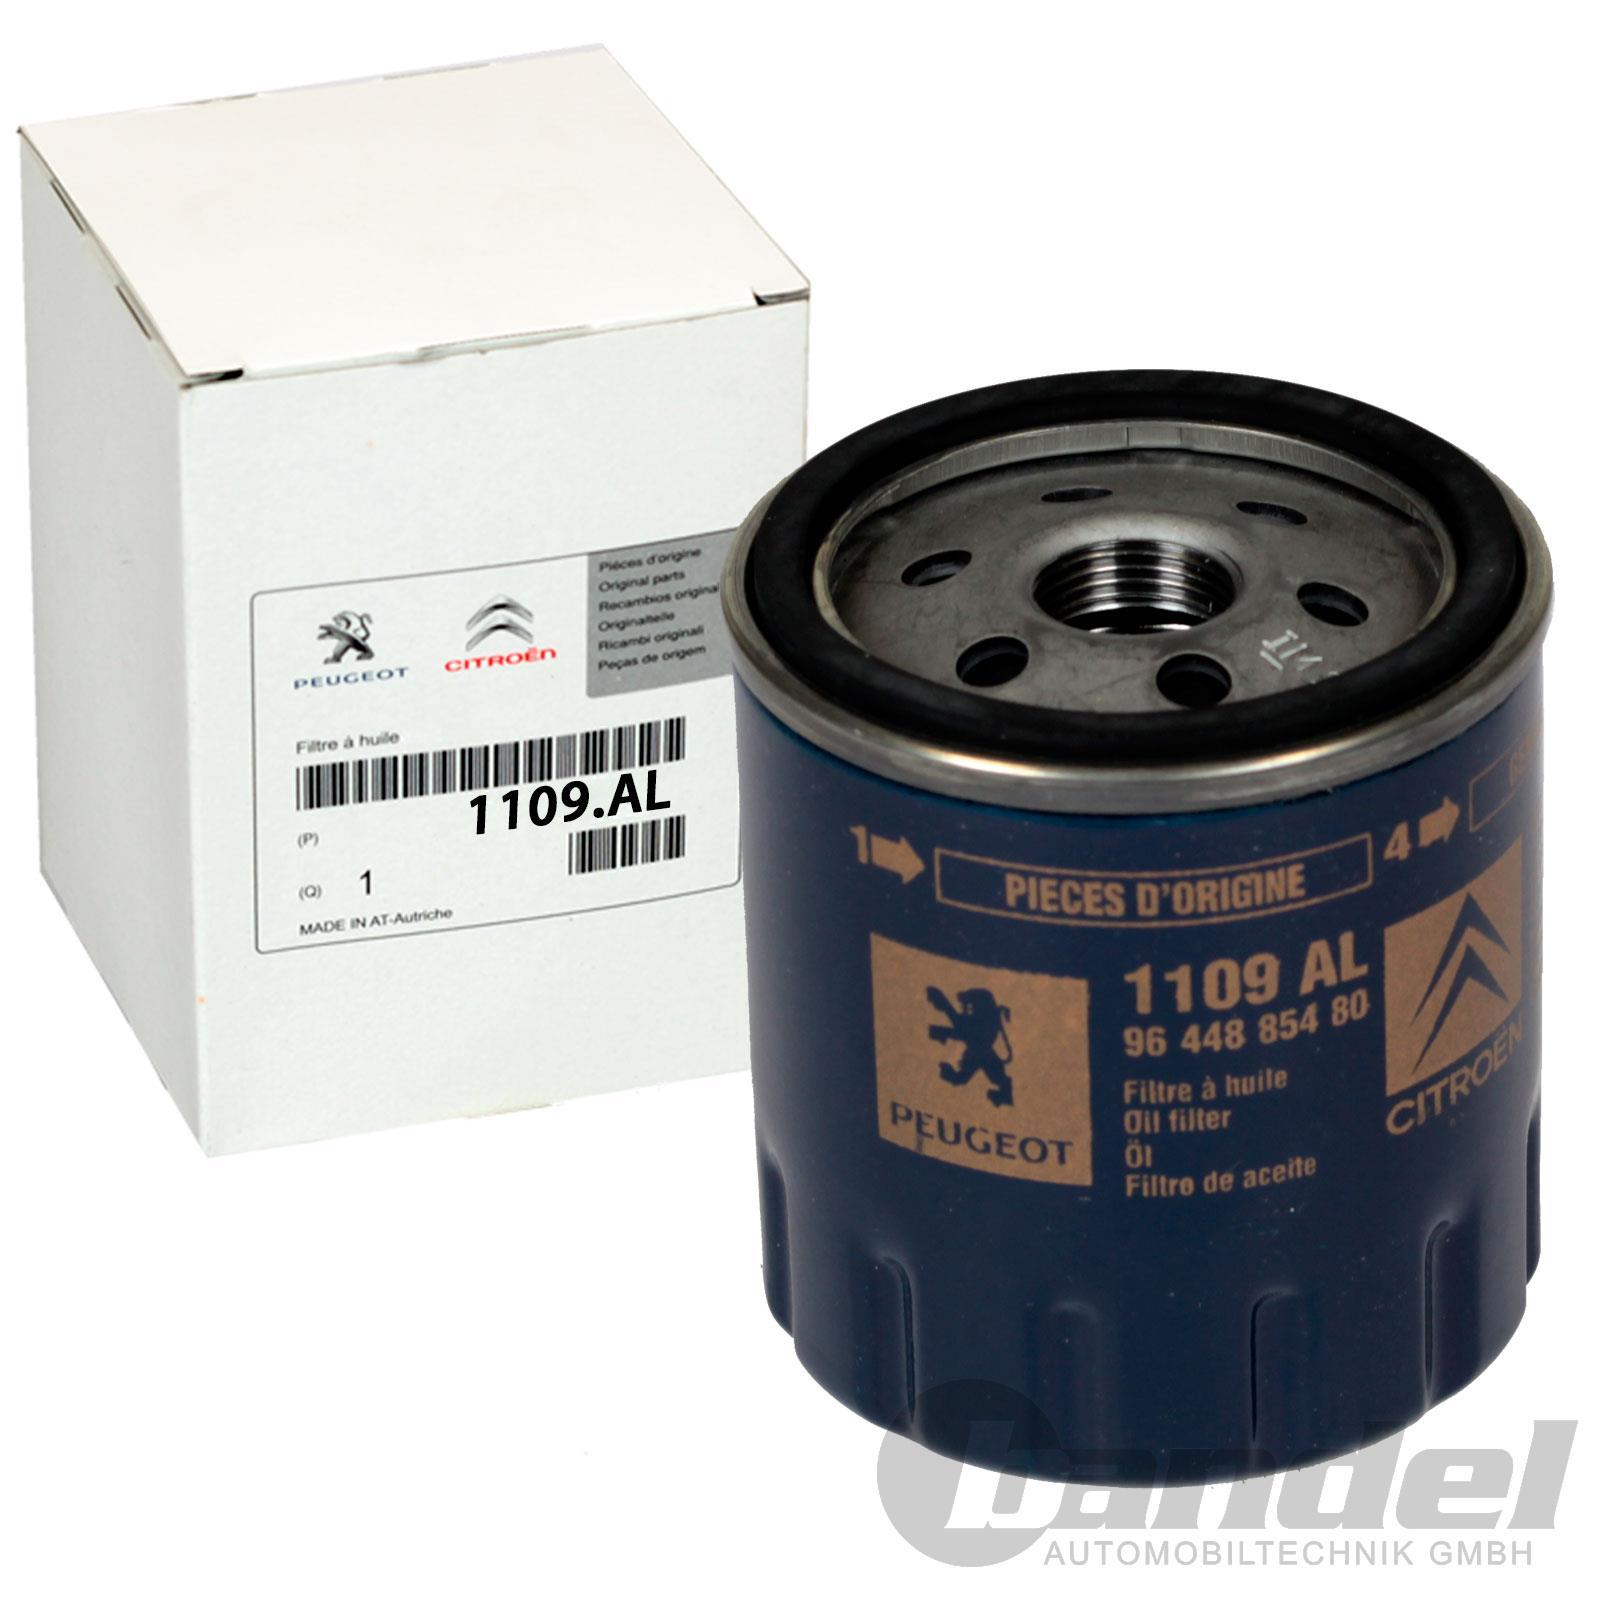 Original citroen peugeot inspektionskit Jumper boxer 2.0 bluehdi 2.2 HDI 3.0 HDI